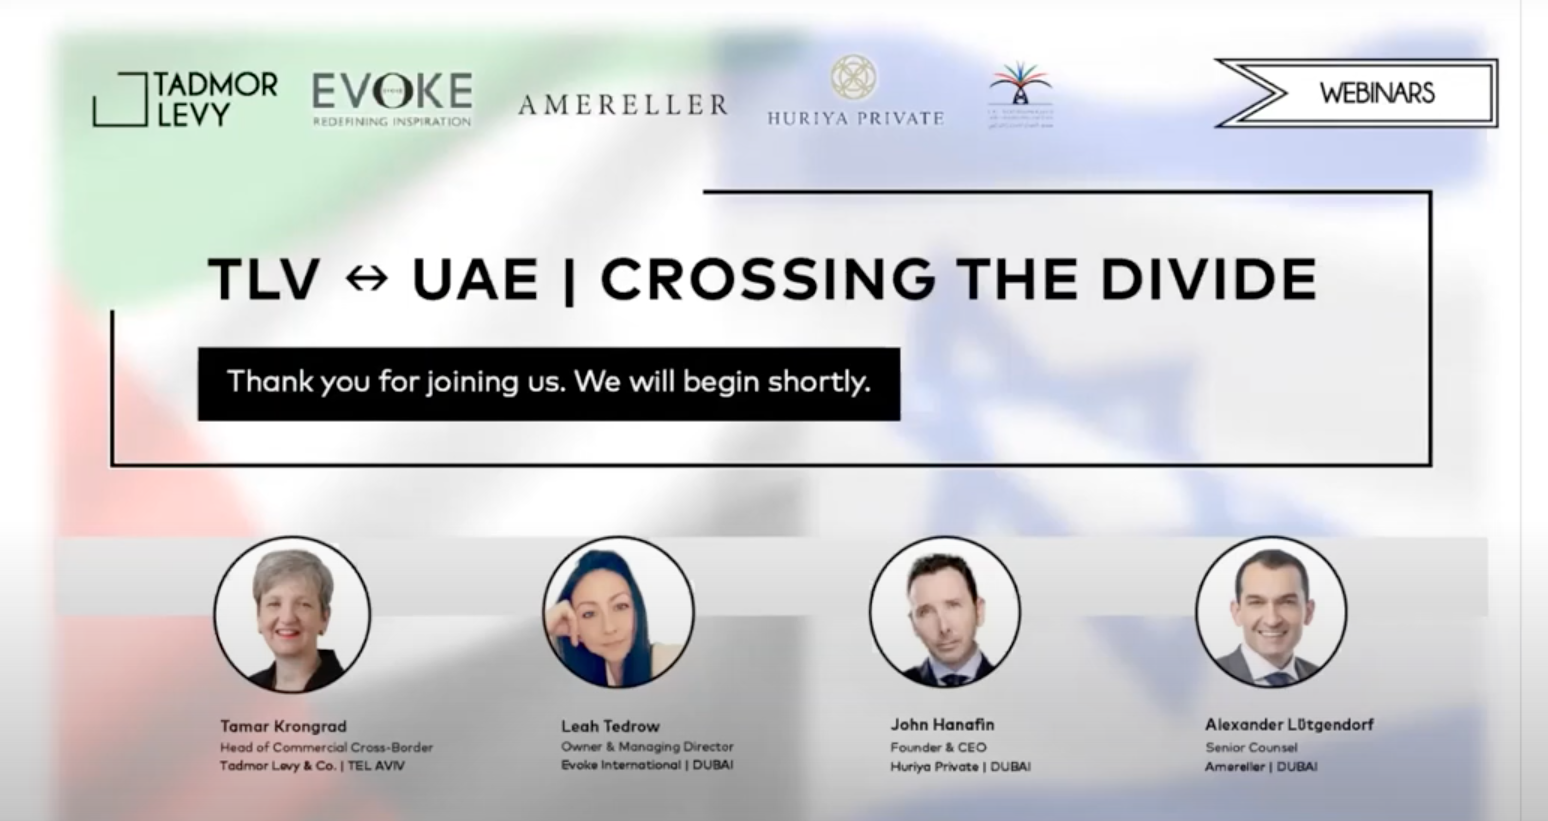 Israel UAE Relations. Evoke International Dubai - PR, Strategic Communication, Marketing, Design